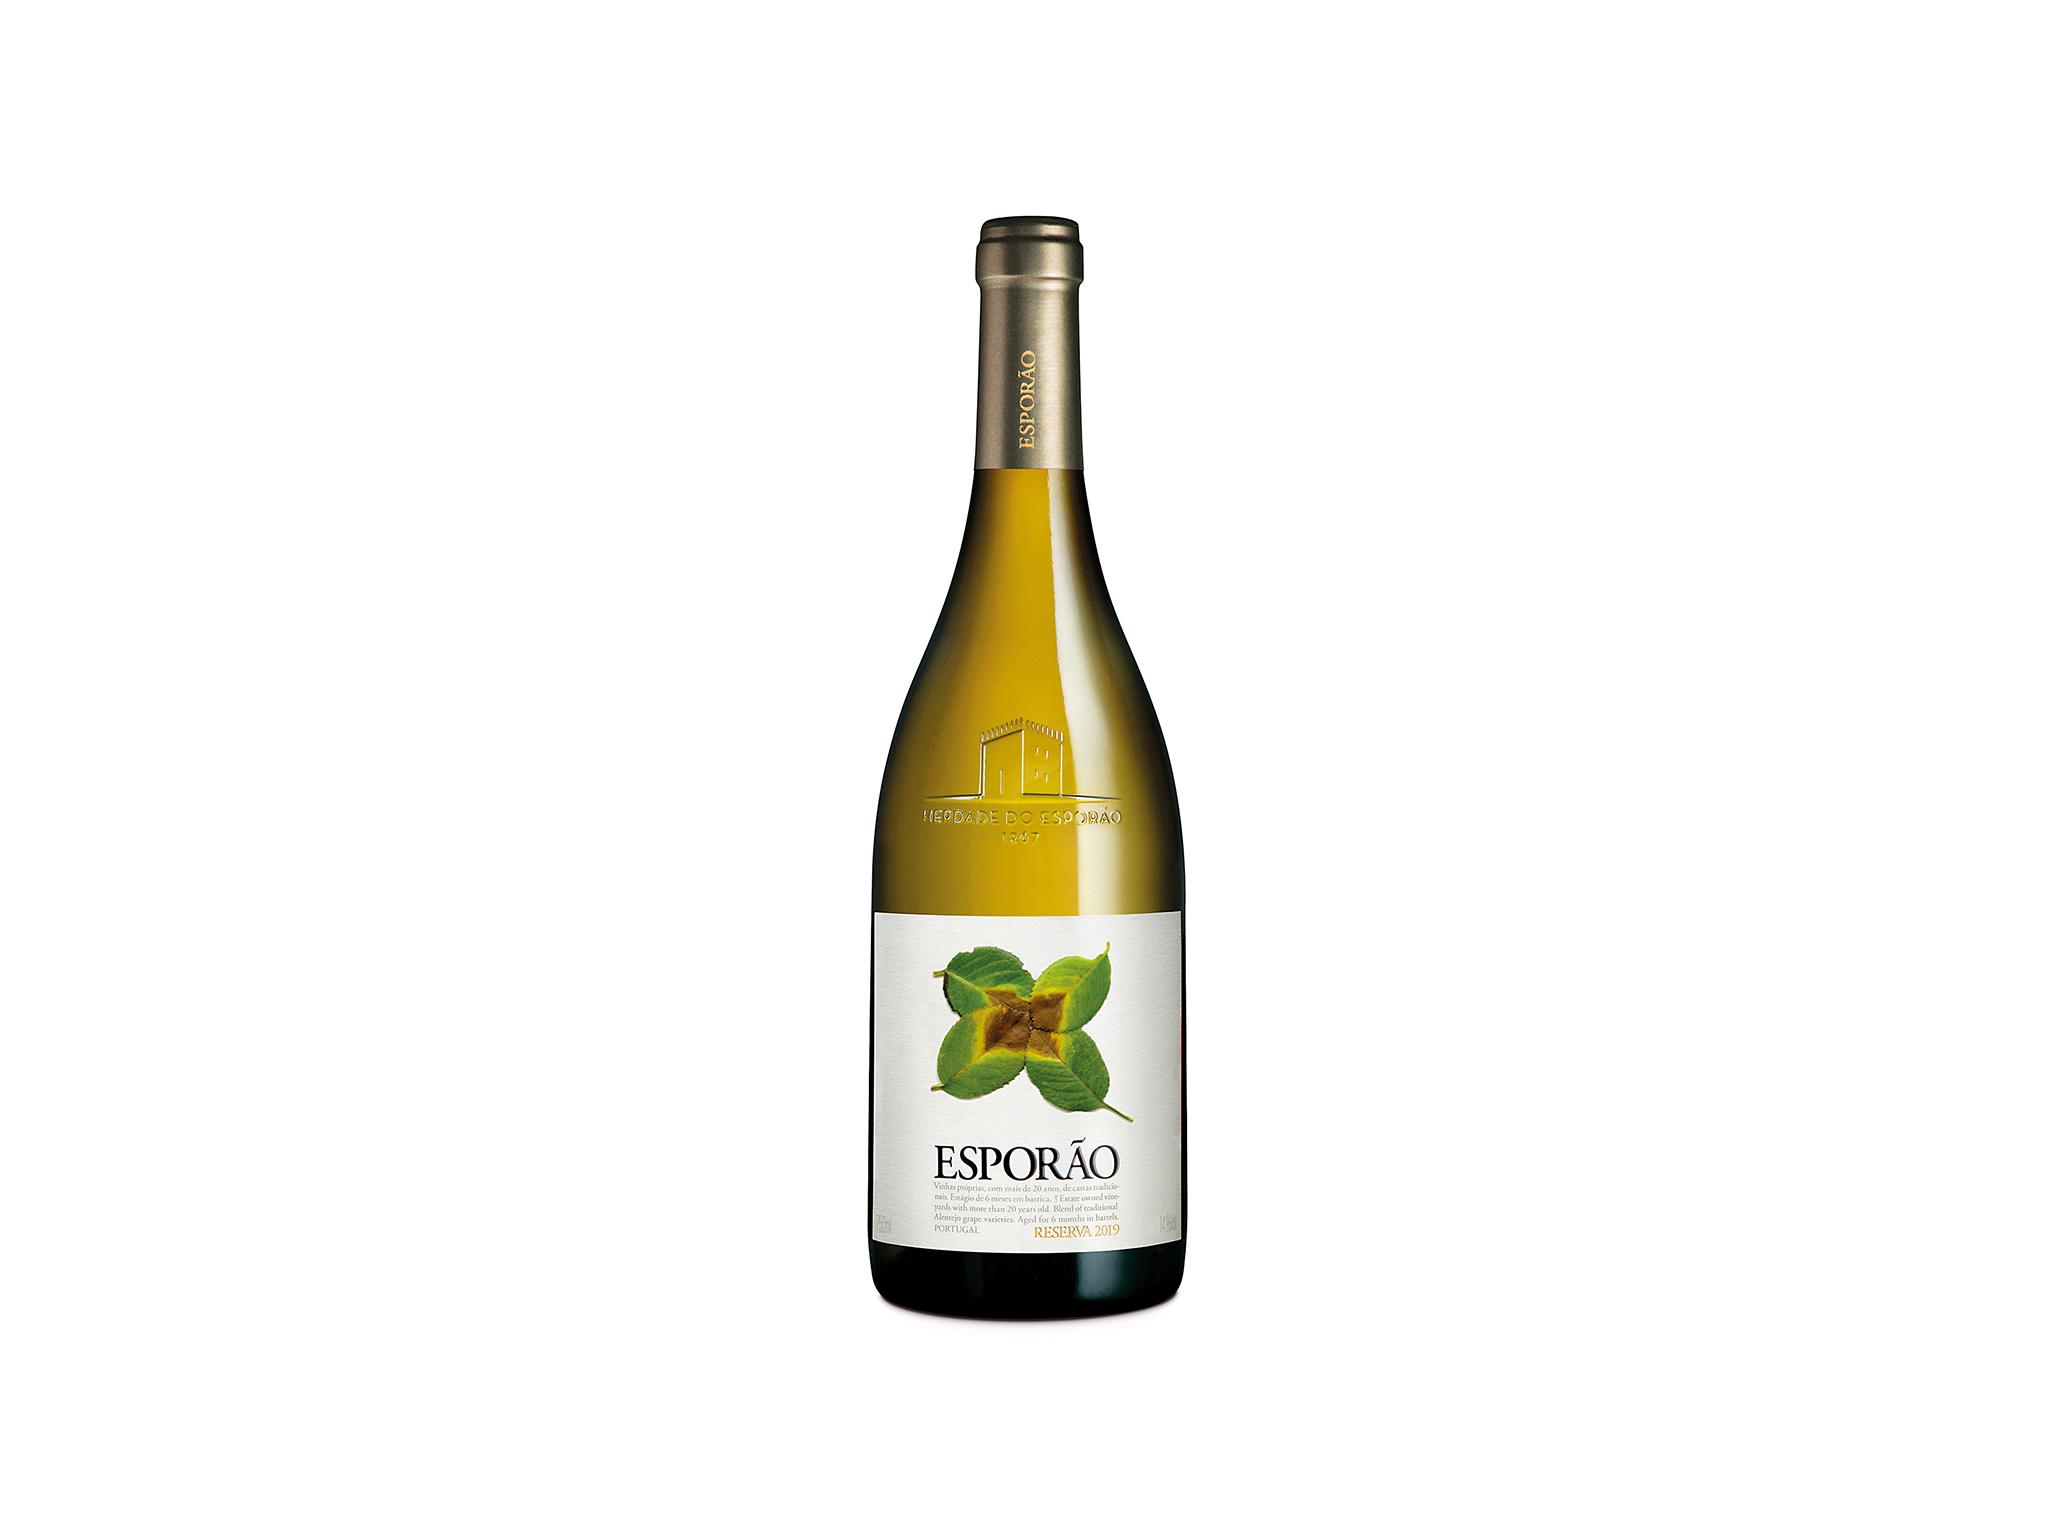 Vinho, Esporão Reserva Branco 2019, Alentejo